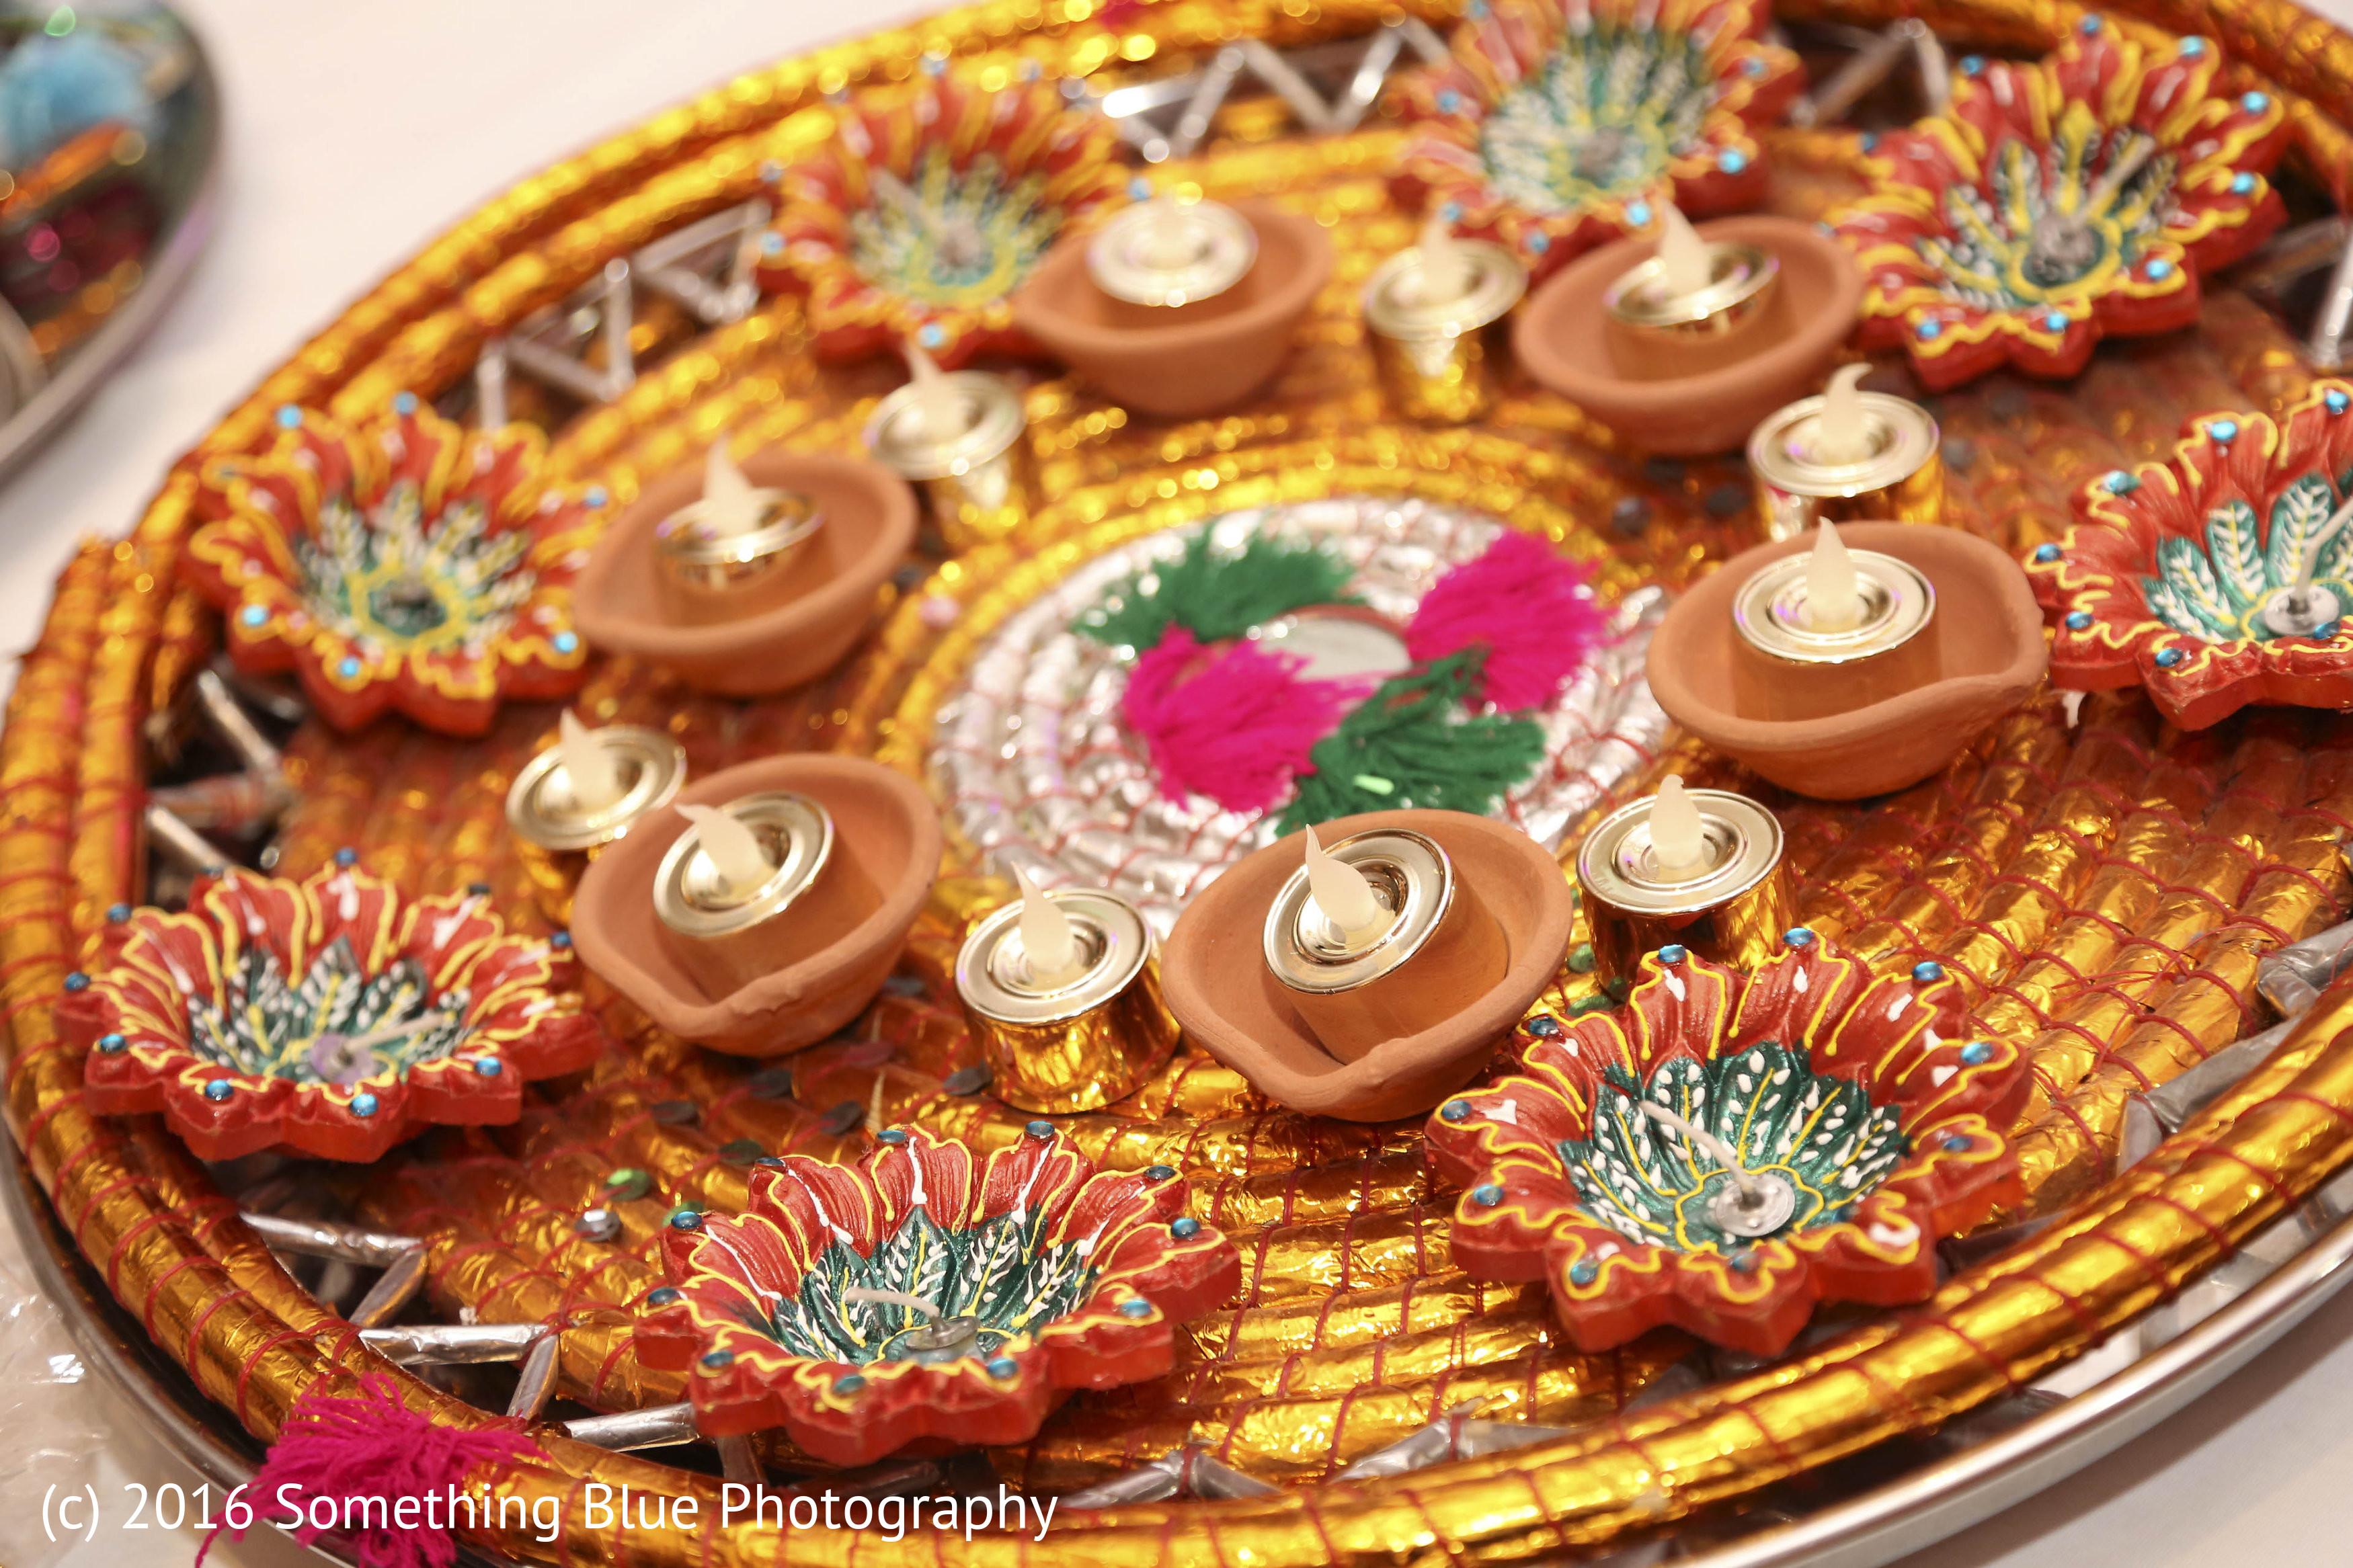 Mehndi Plates Decoration Tips  Image gallery mehndi decorations & Mehndi Plates Decoration Tips: Image gallery mehndi decorations.